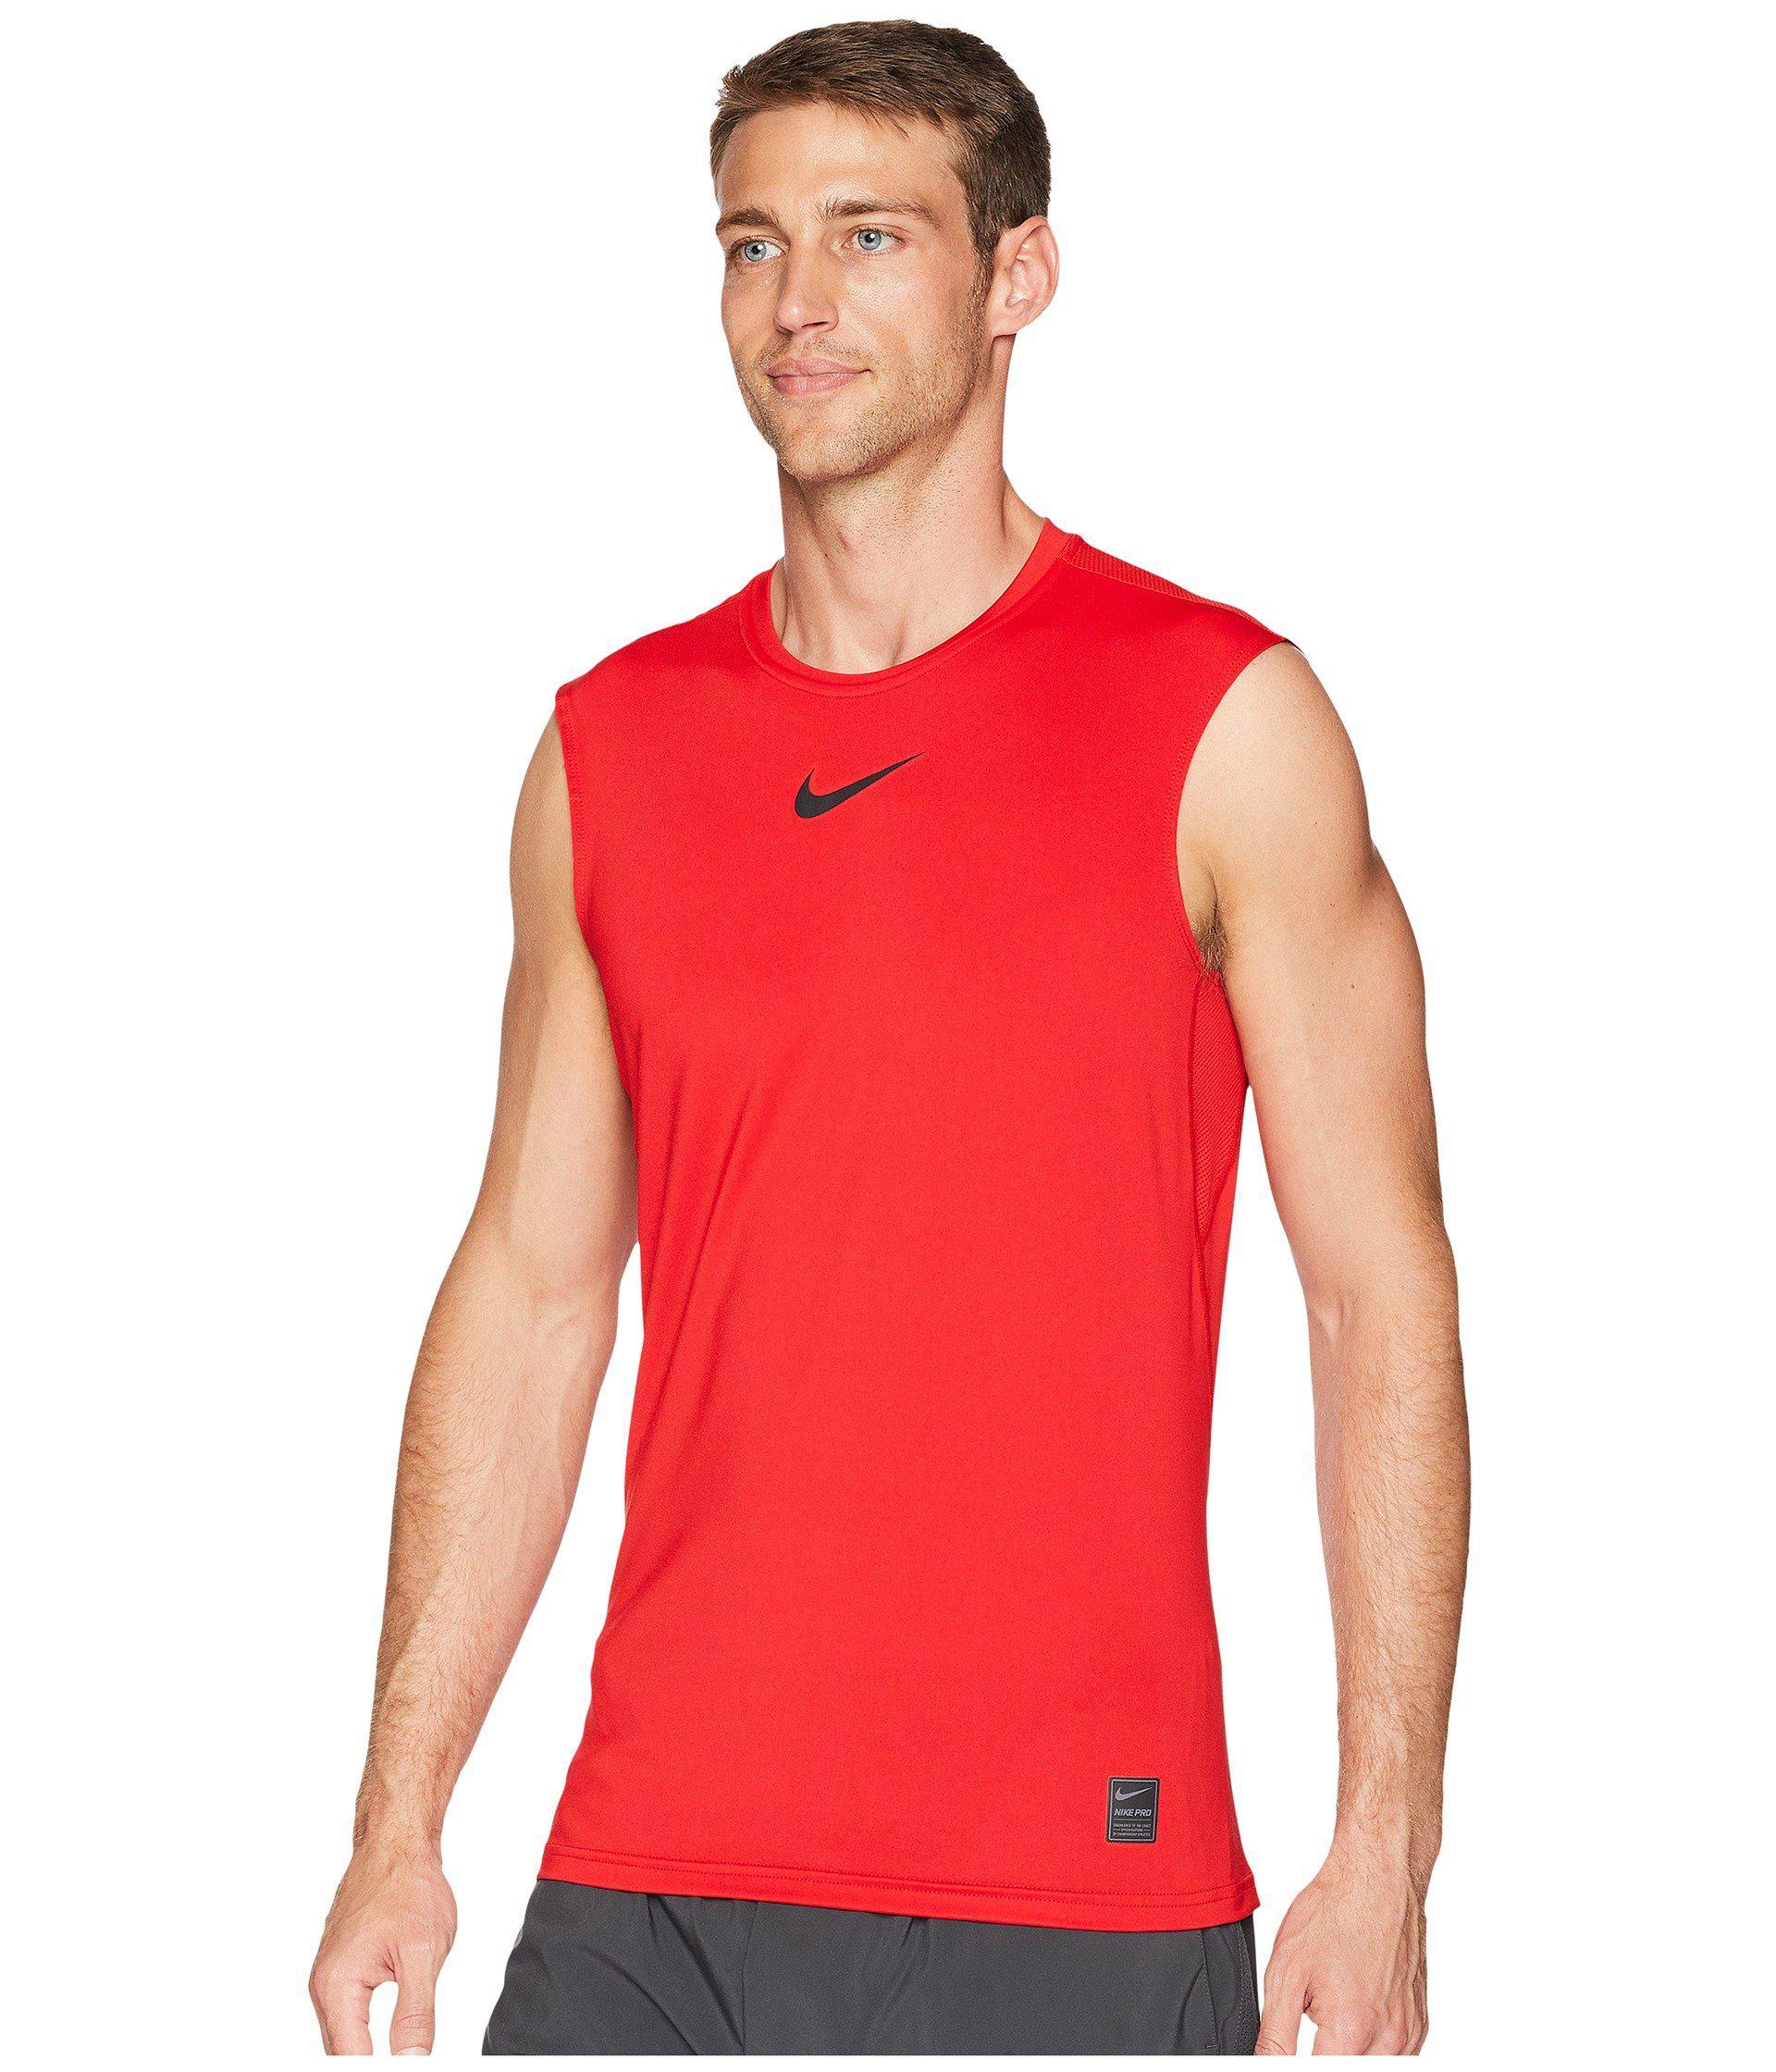 9eb8c2c62a15c Lyst - Nike Pro Fitted Sleeveless Training Top (black white white) Men s  Sleeveless in Red for Men